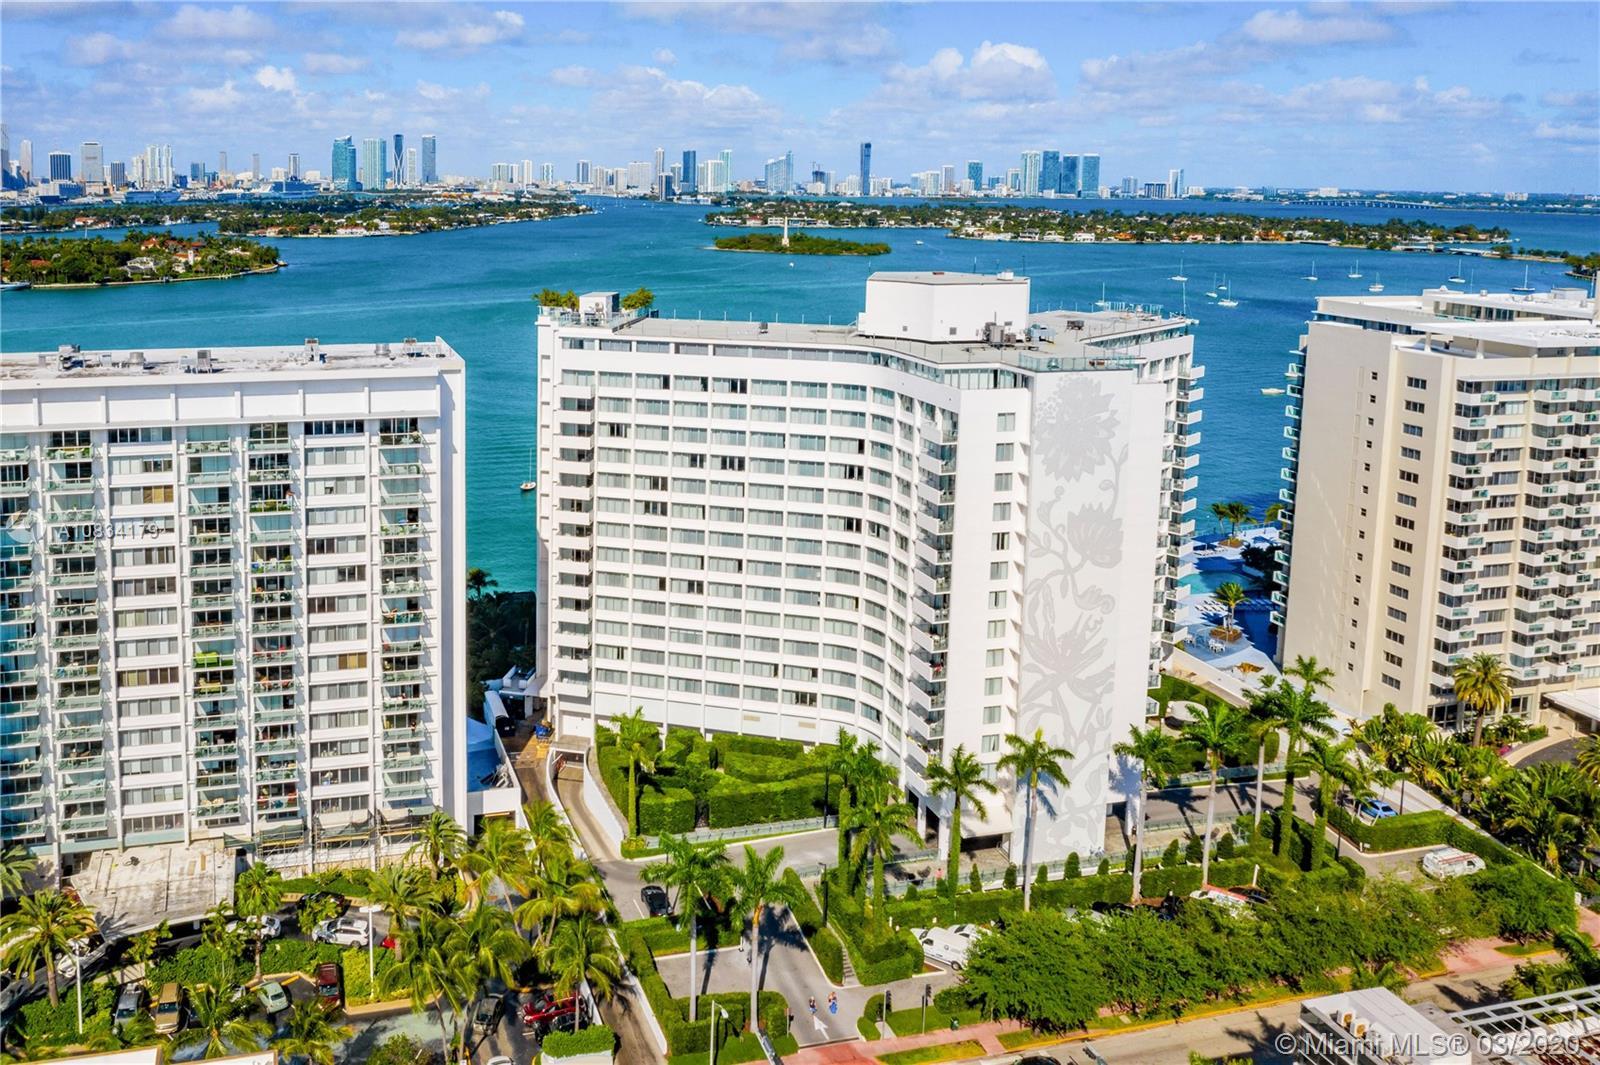 1100 West Ave #314, Miami Beach, FL 33139 - Miami Beach, FL real estate listing